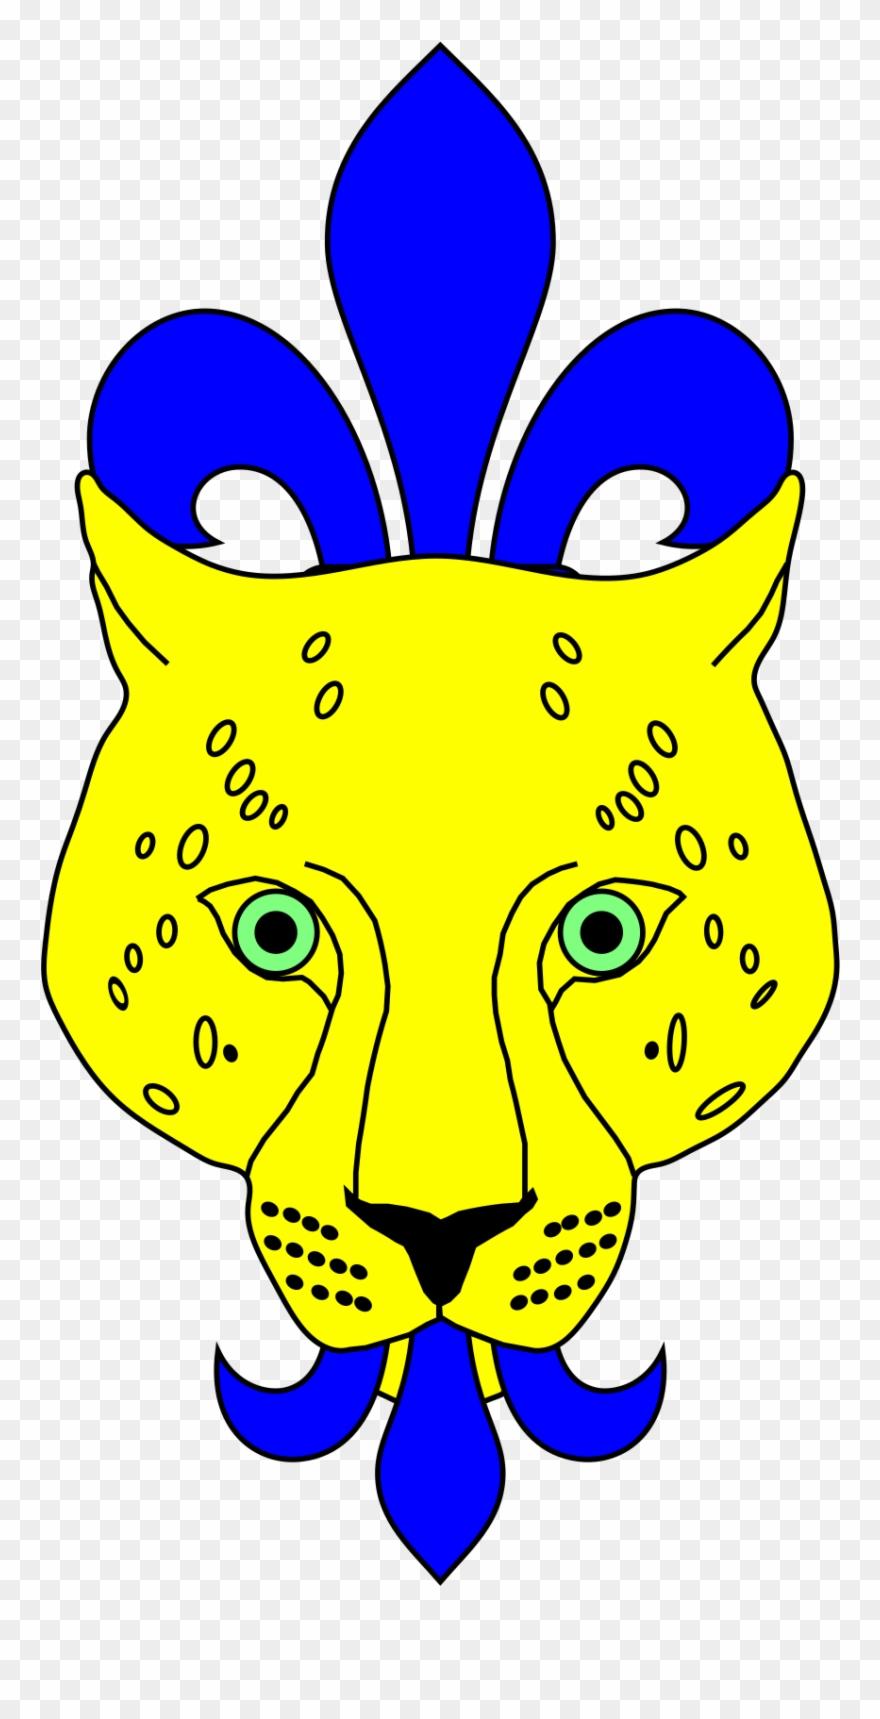 leopard # 4946098